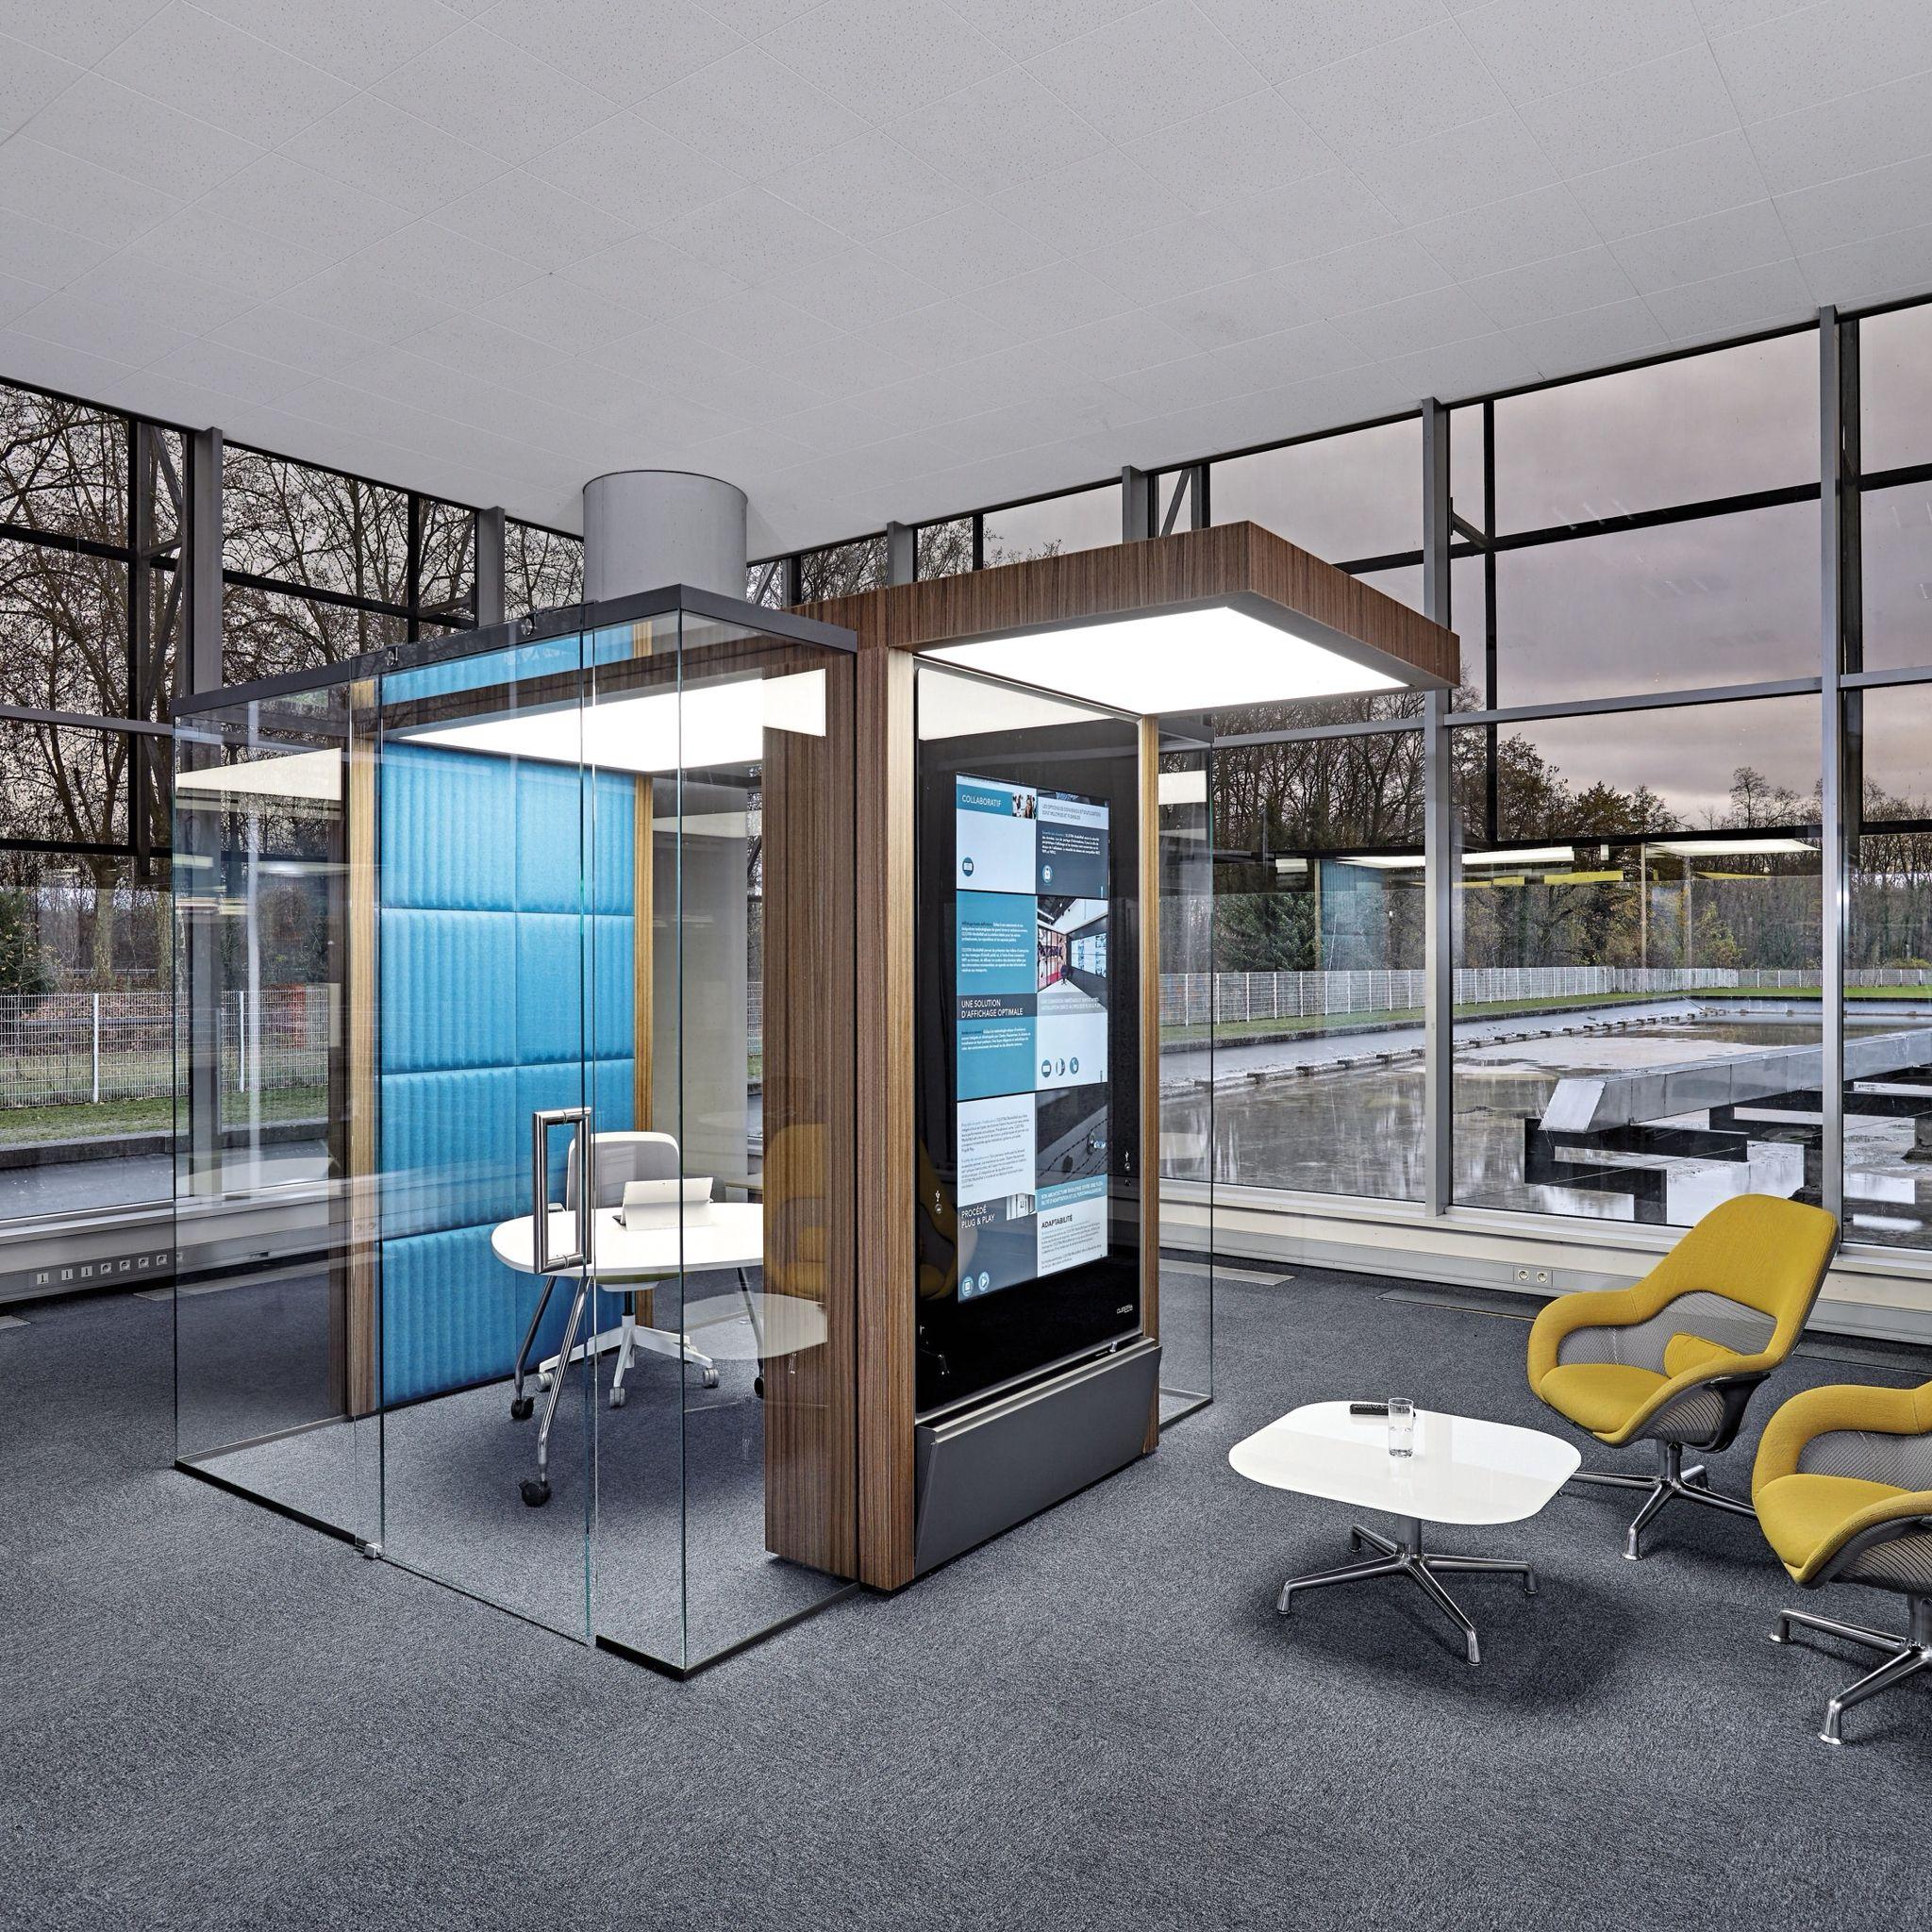 IRYS/ Modular Workspace Solution/ Clestra Hauserman,  Illkirch Graffenstaden, Design:HOK